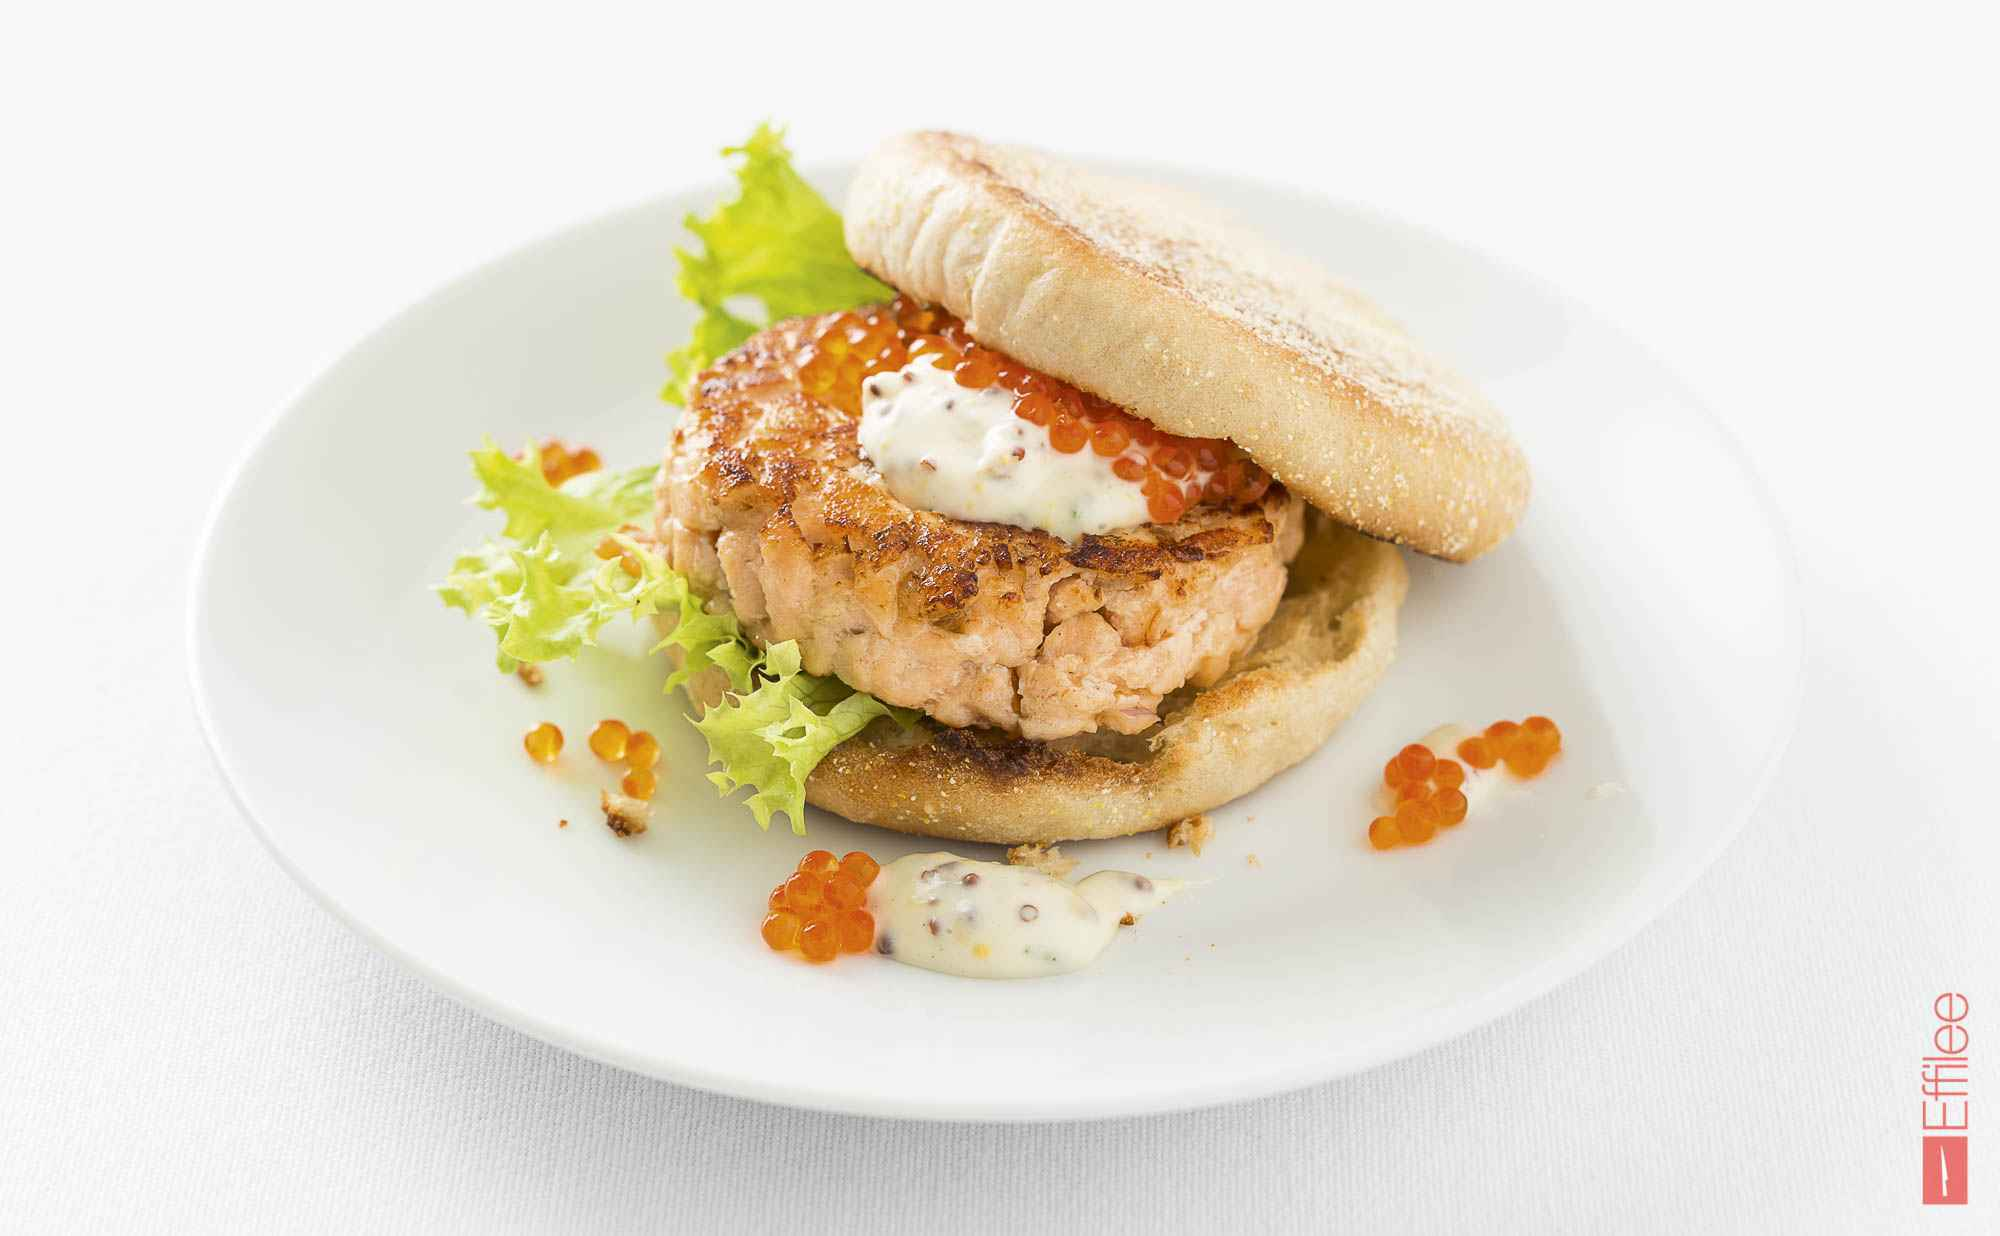 Go to Lachs-Tatar-Burger